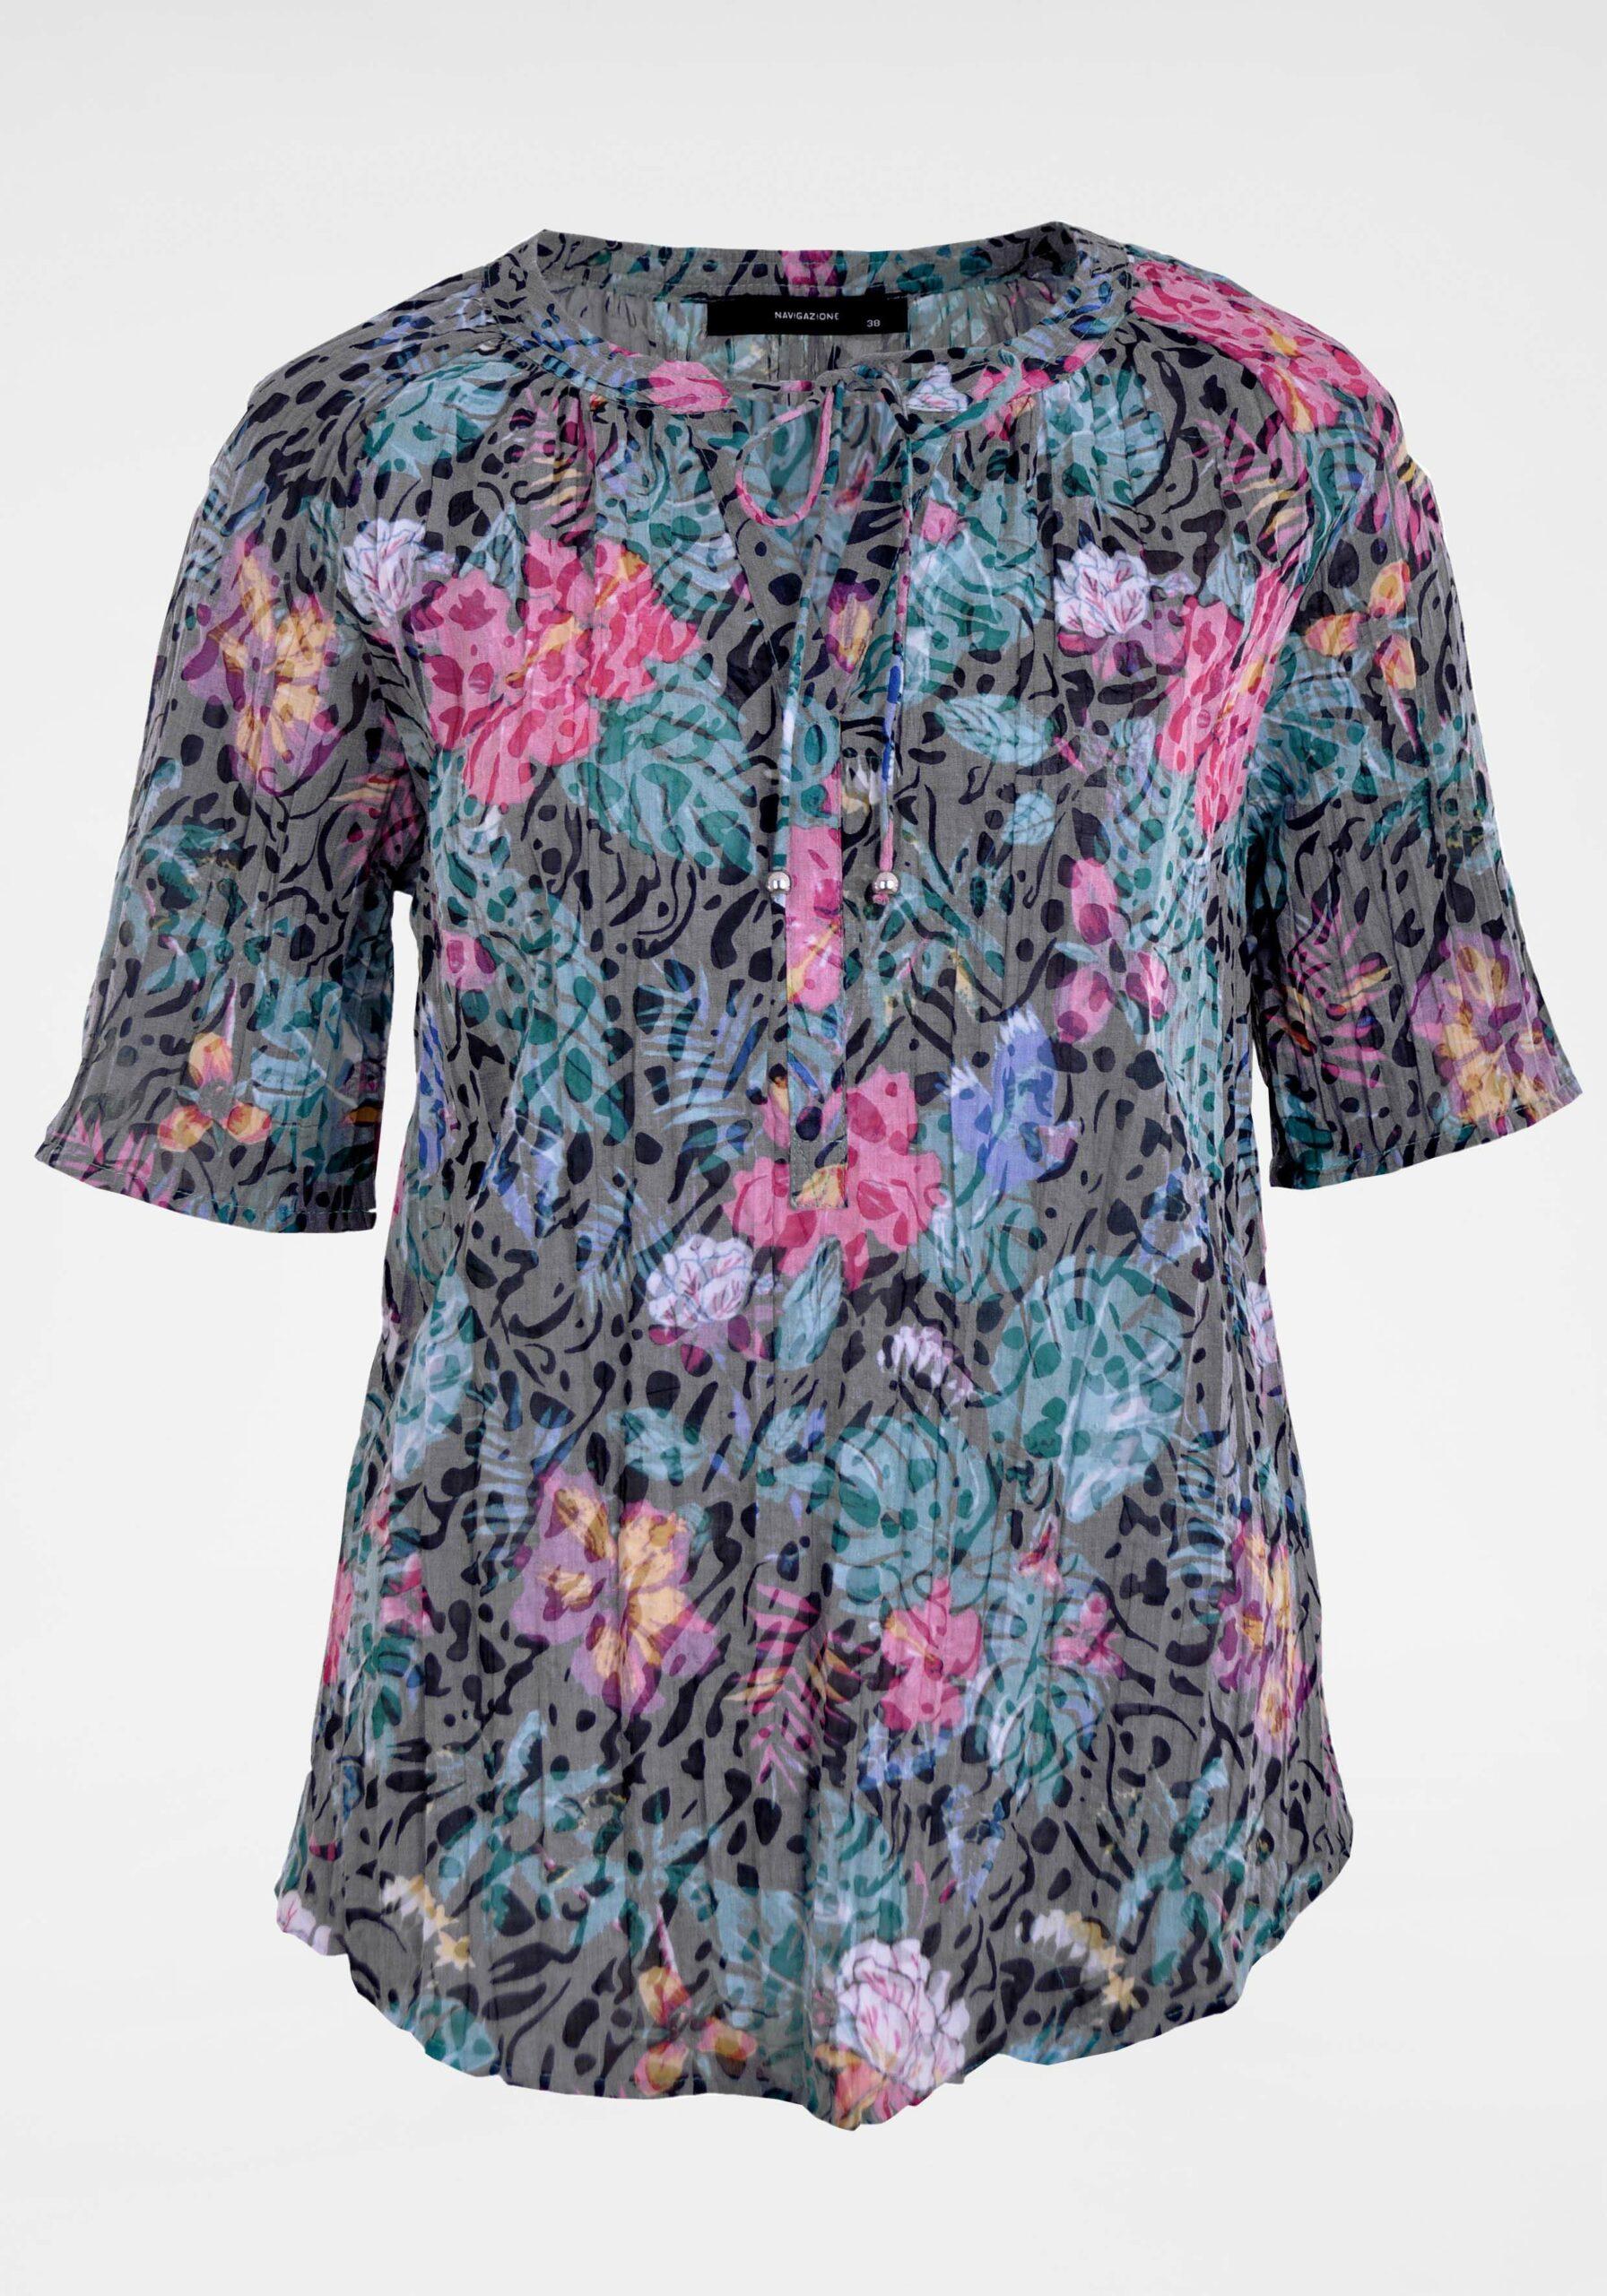 Damen Bluse in kräftigen Farben